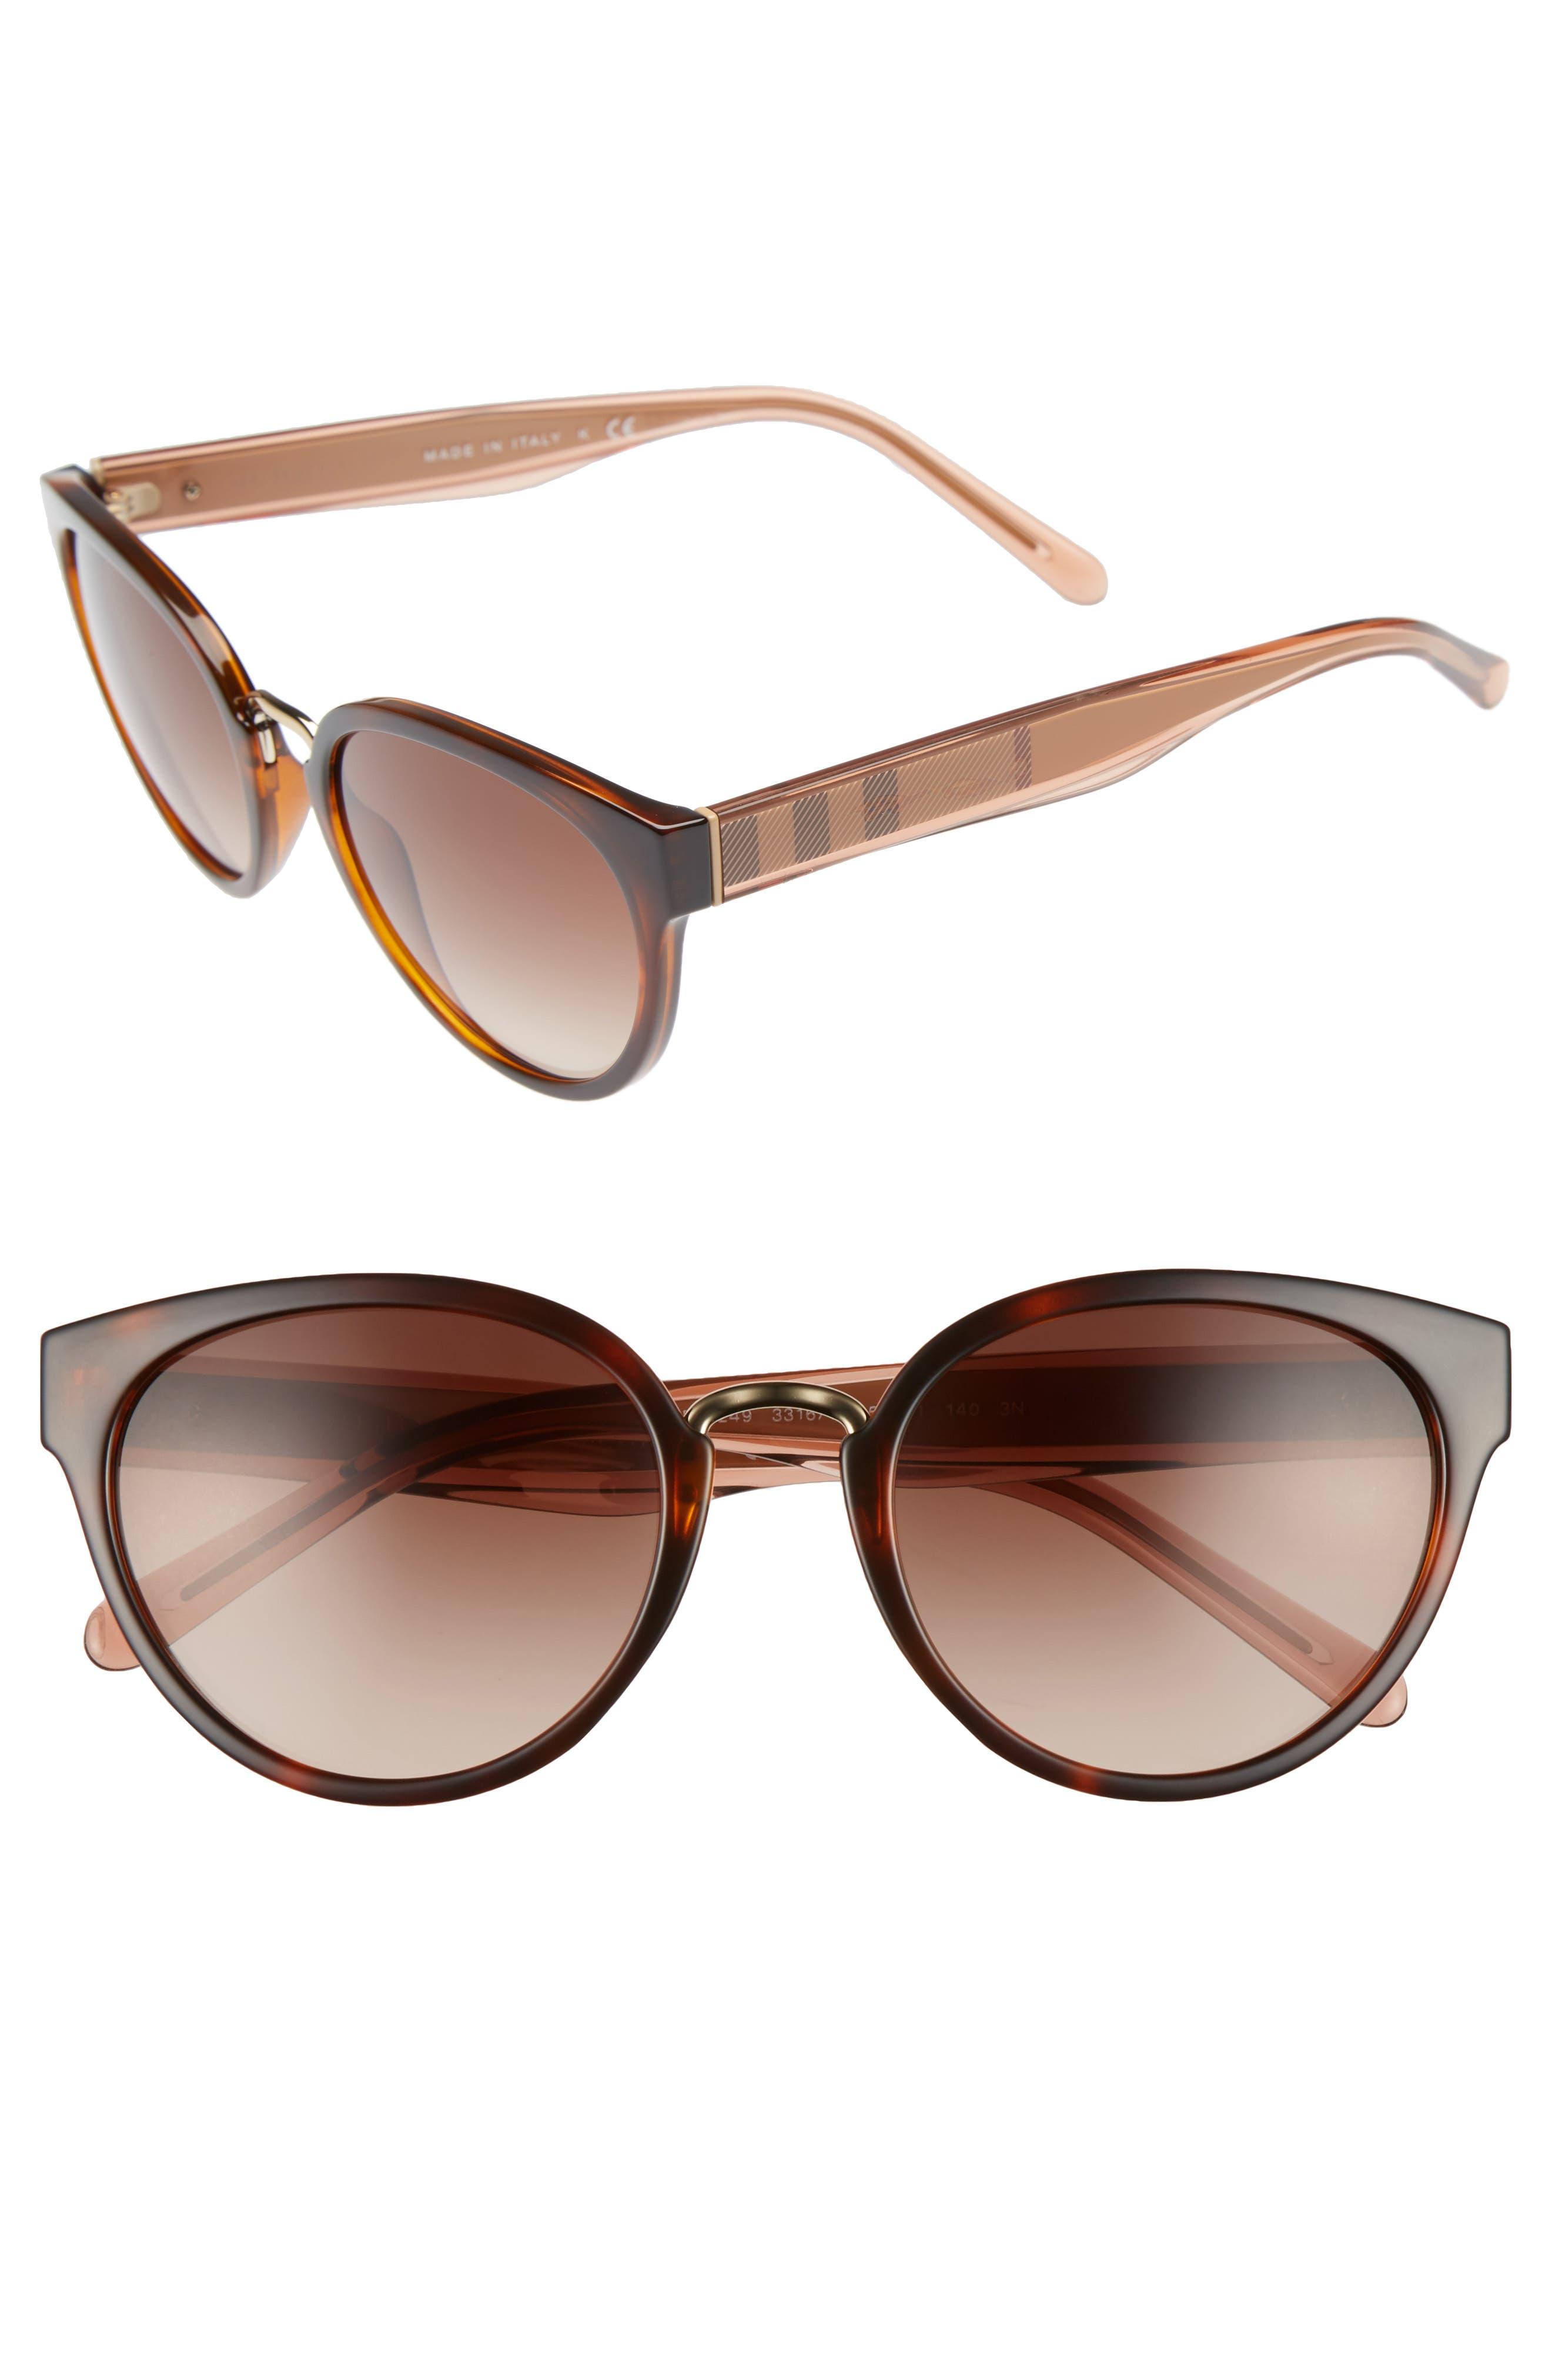 53mm Gradient Cat Eye Sunglasses,                             Main thumbnail 2, color,